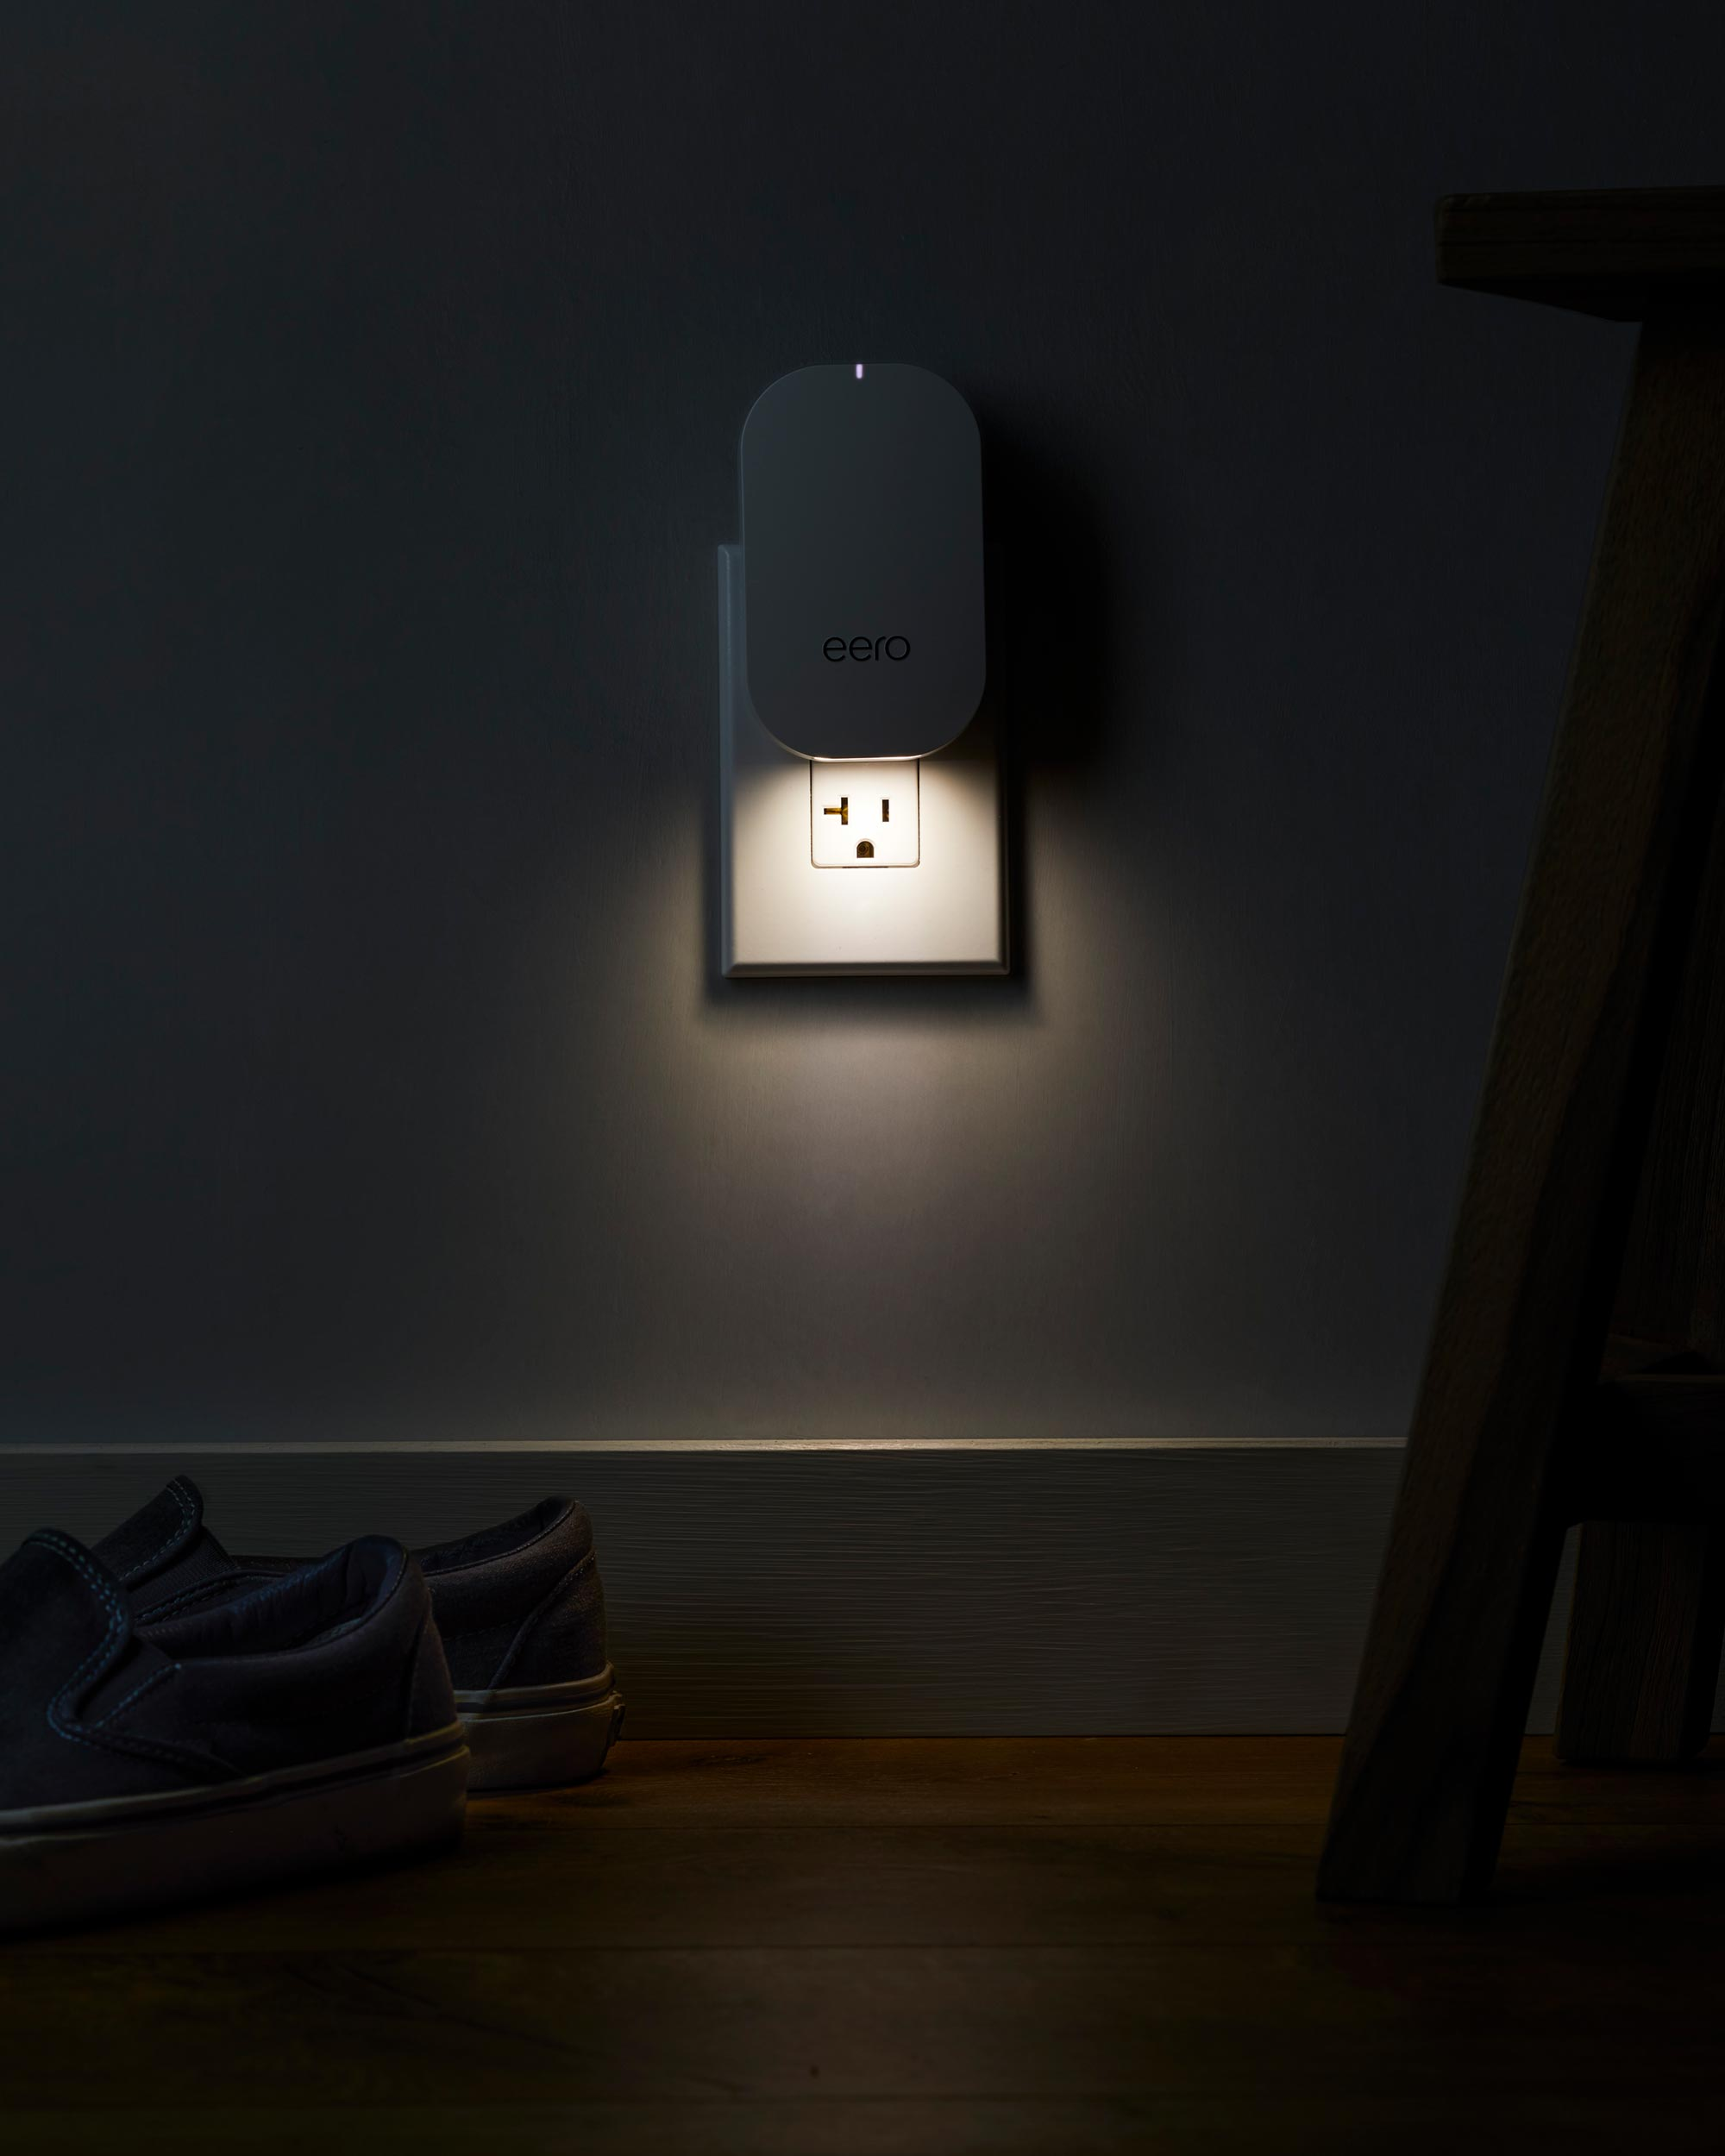 eero_beacon_glow_dark.jpg